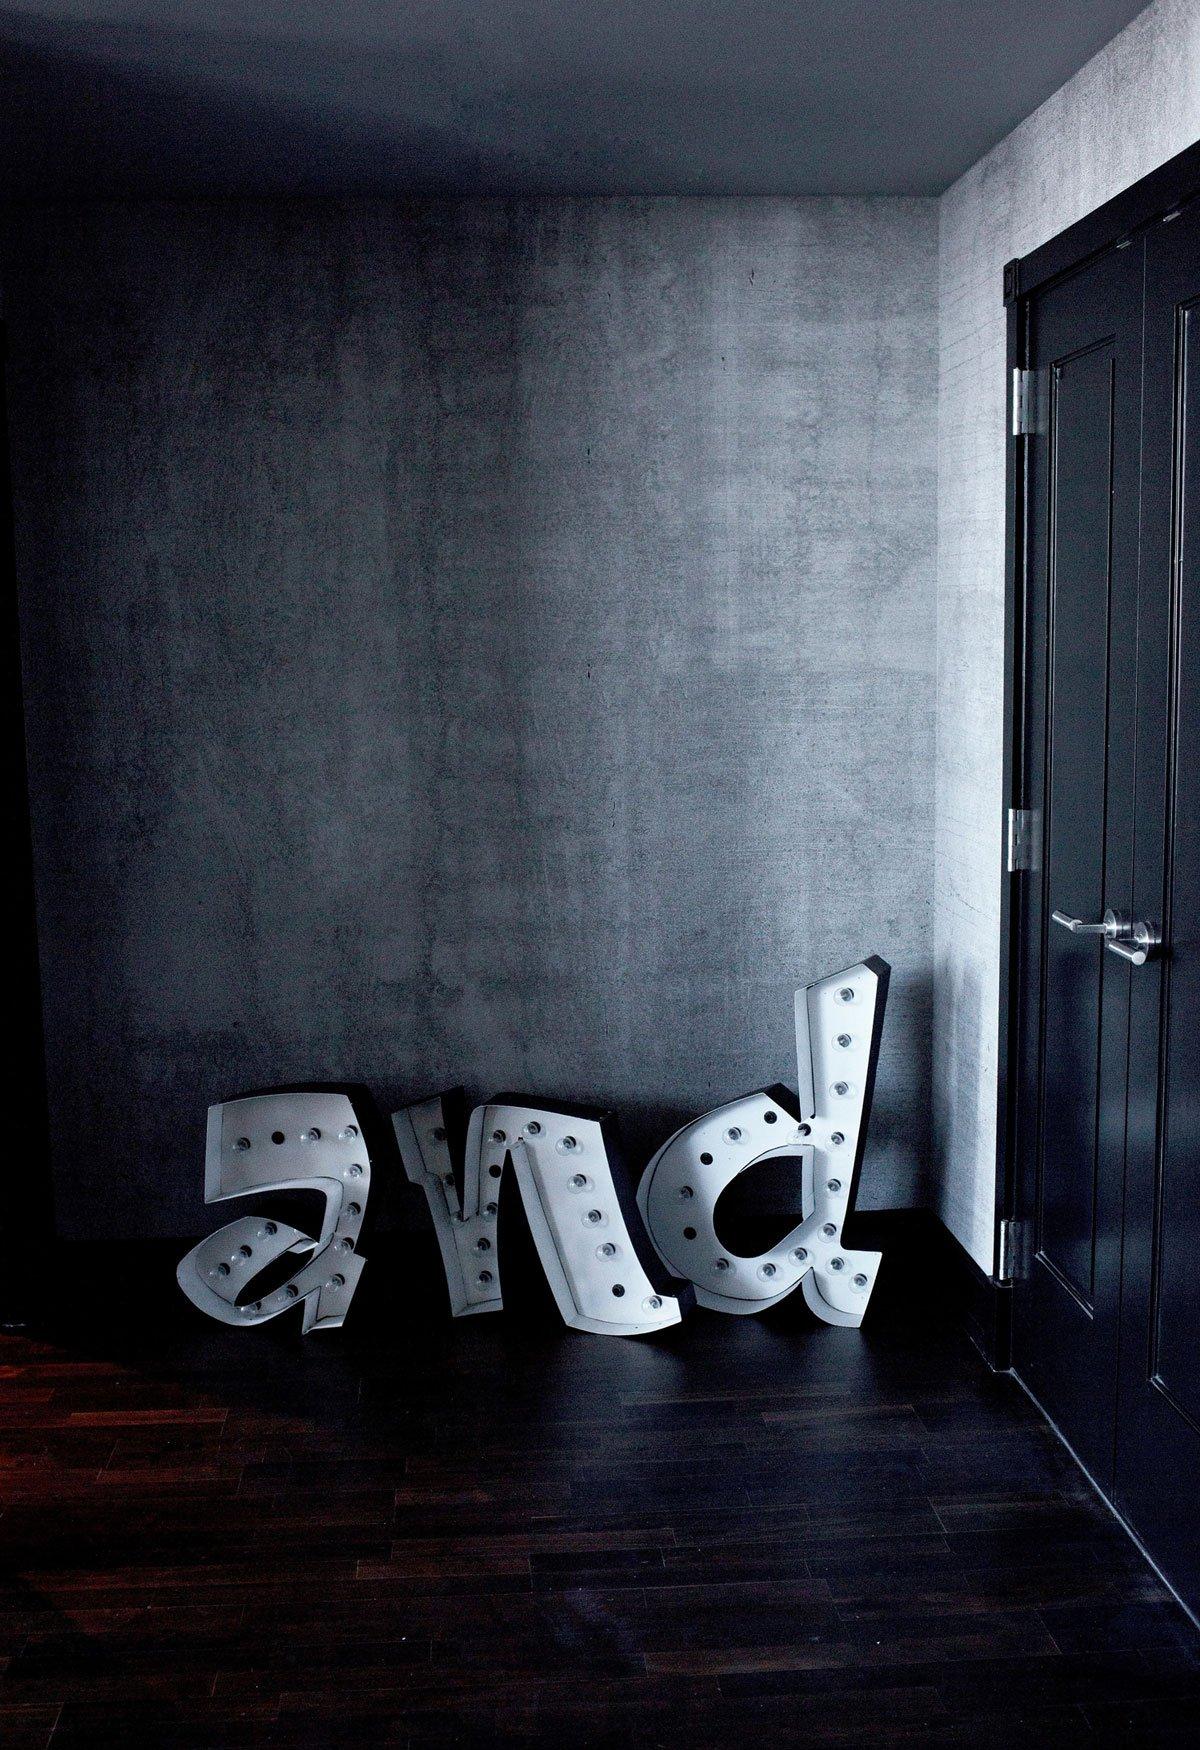 Acrila, Zaha Hadid Slamp, Yolo, Baxter, Irish Maschek, Abigail Abern, Voila Gallery, Vahallan, Irish Maschek, готический гламур, лофт, обзор лофта